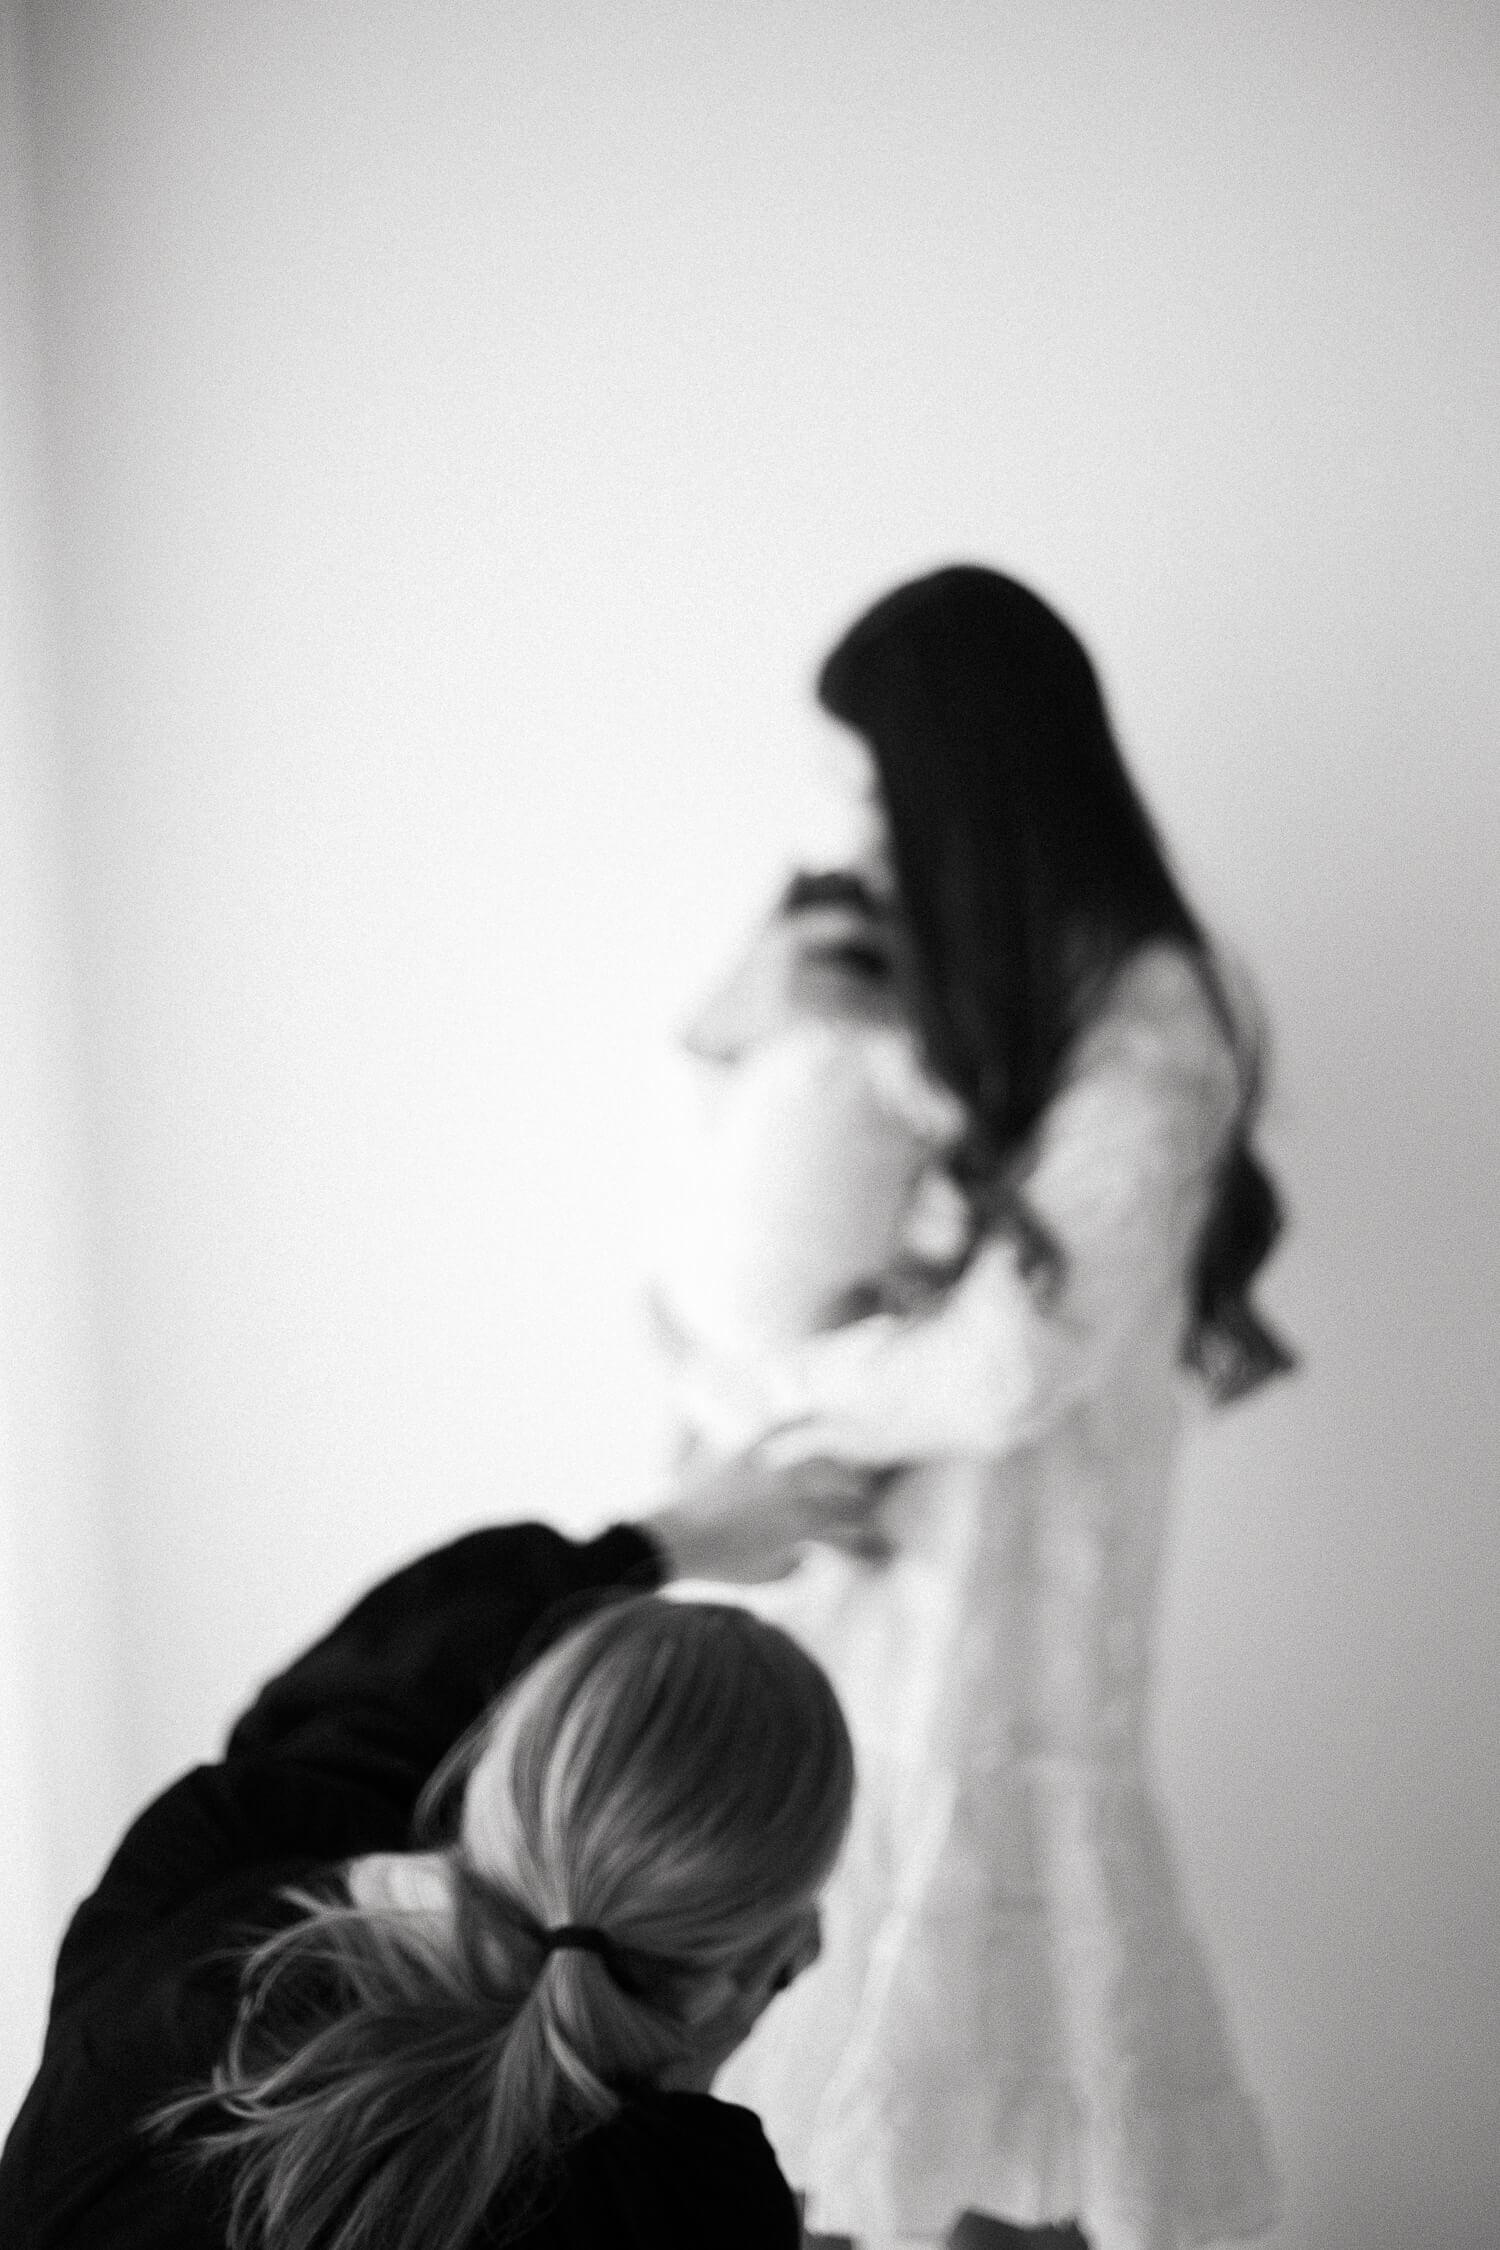 Helia Visuals workshop - ajatonta newbornkuvausta oppimassa. 26